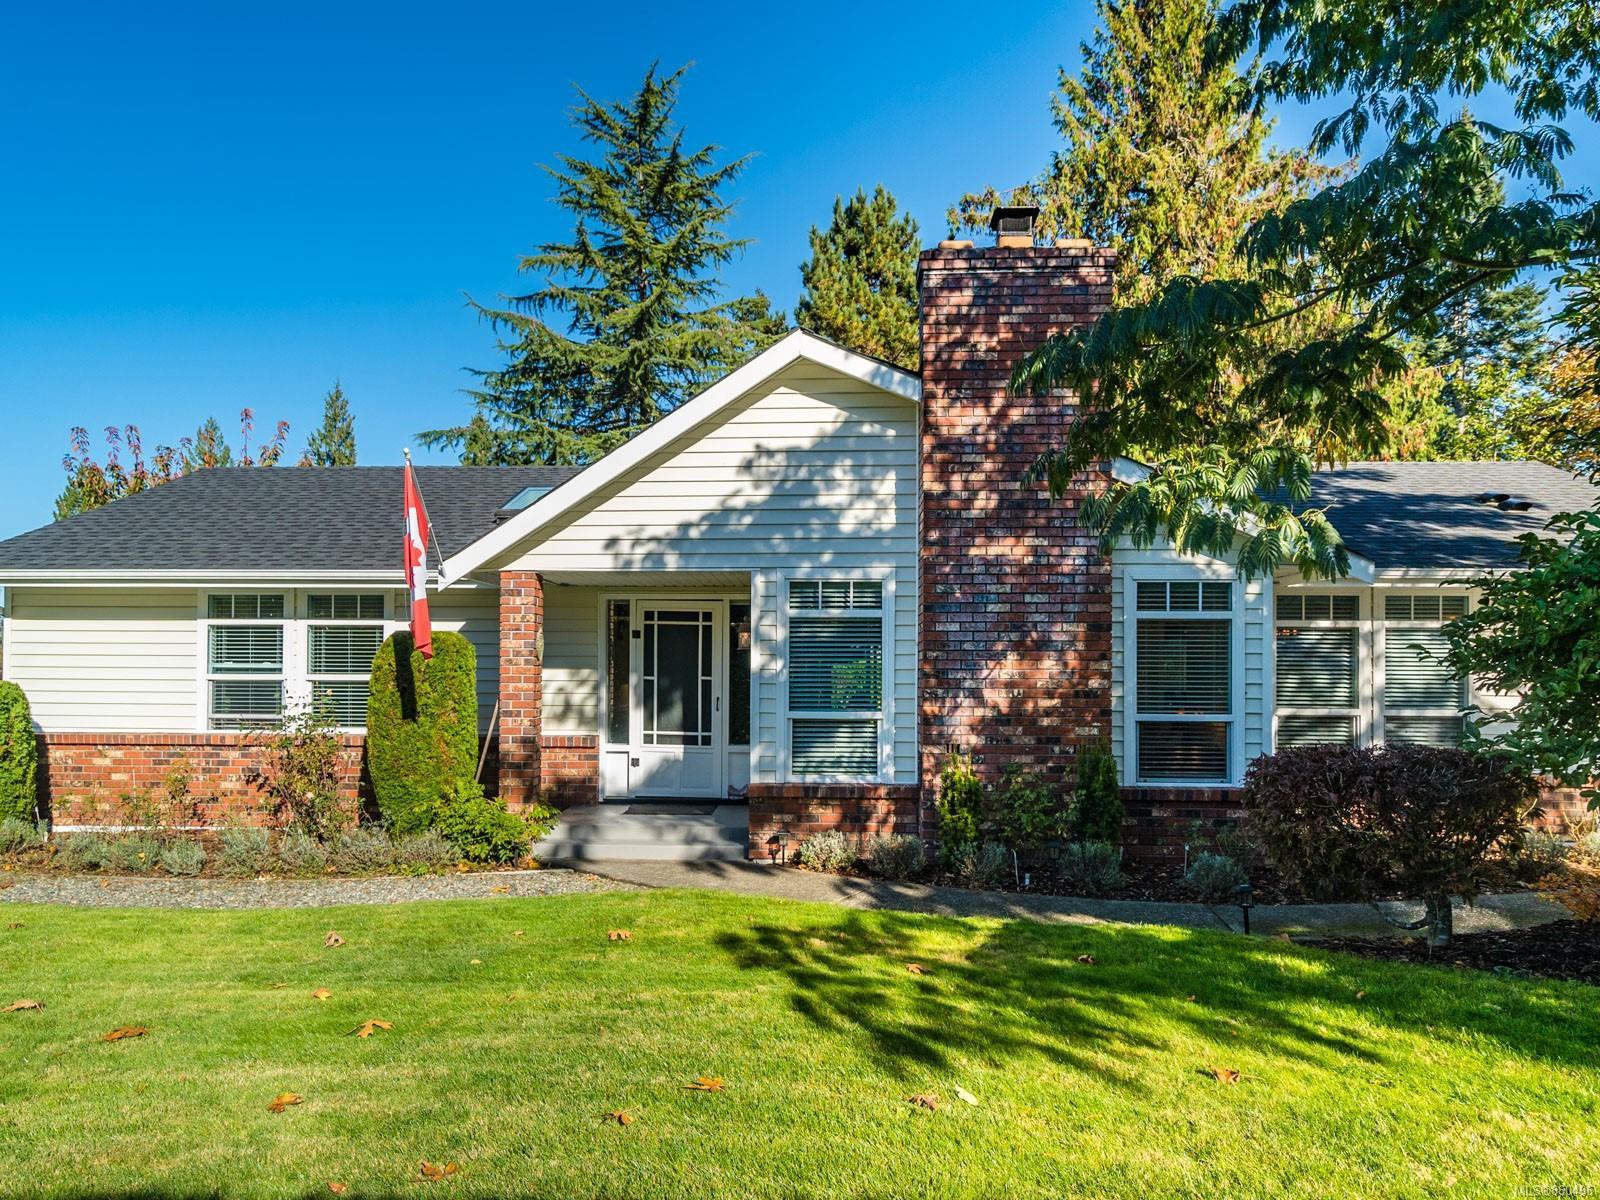 Main Photo: 579 Eaglecrest Dr in : PQ Qualicum Beach House for sale (Parksville/Qualicum)  : MLS®# 860496